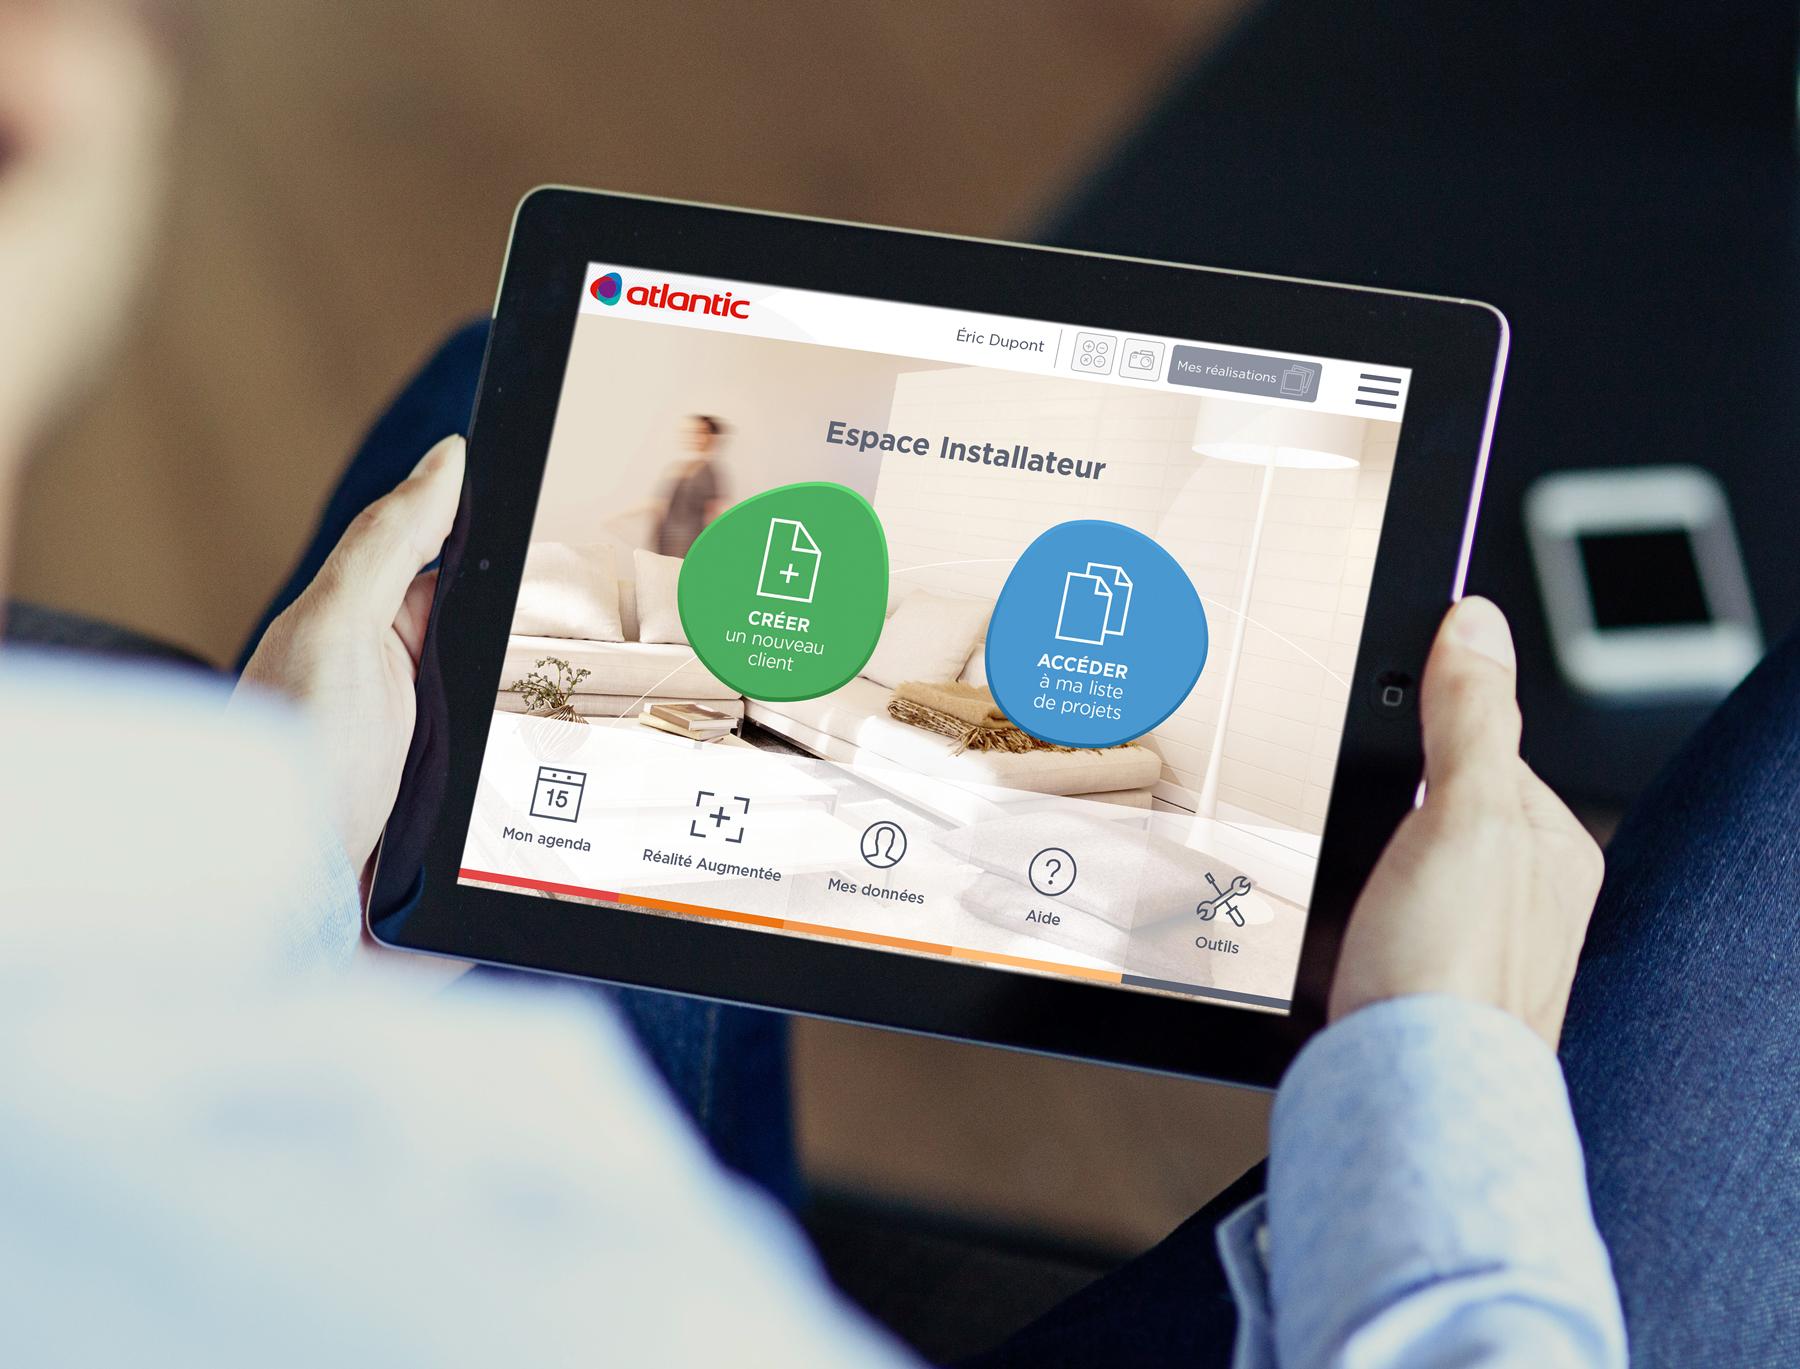 Atlantic application digitale installateurs écran accueil